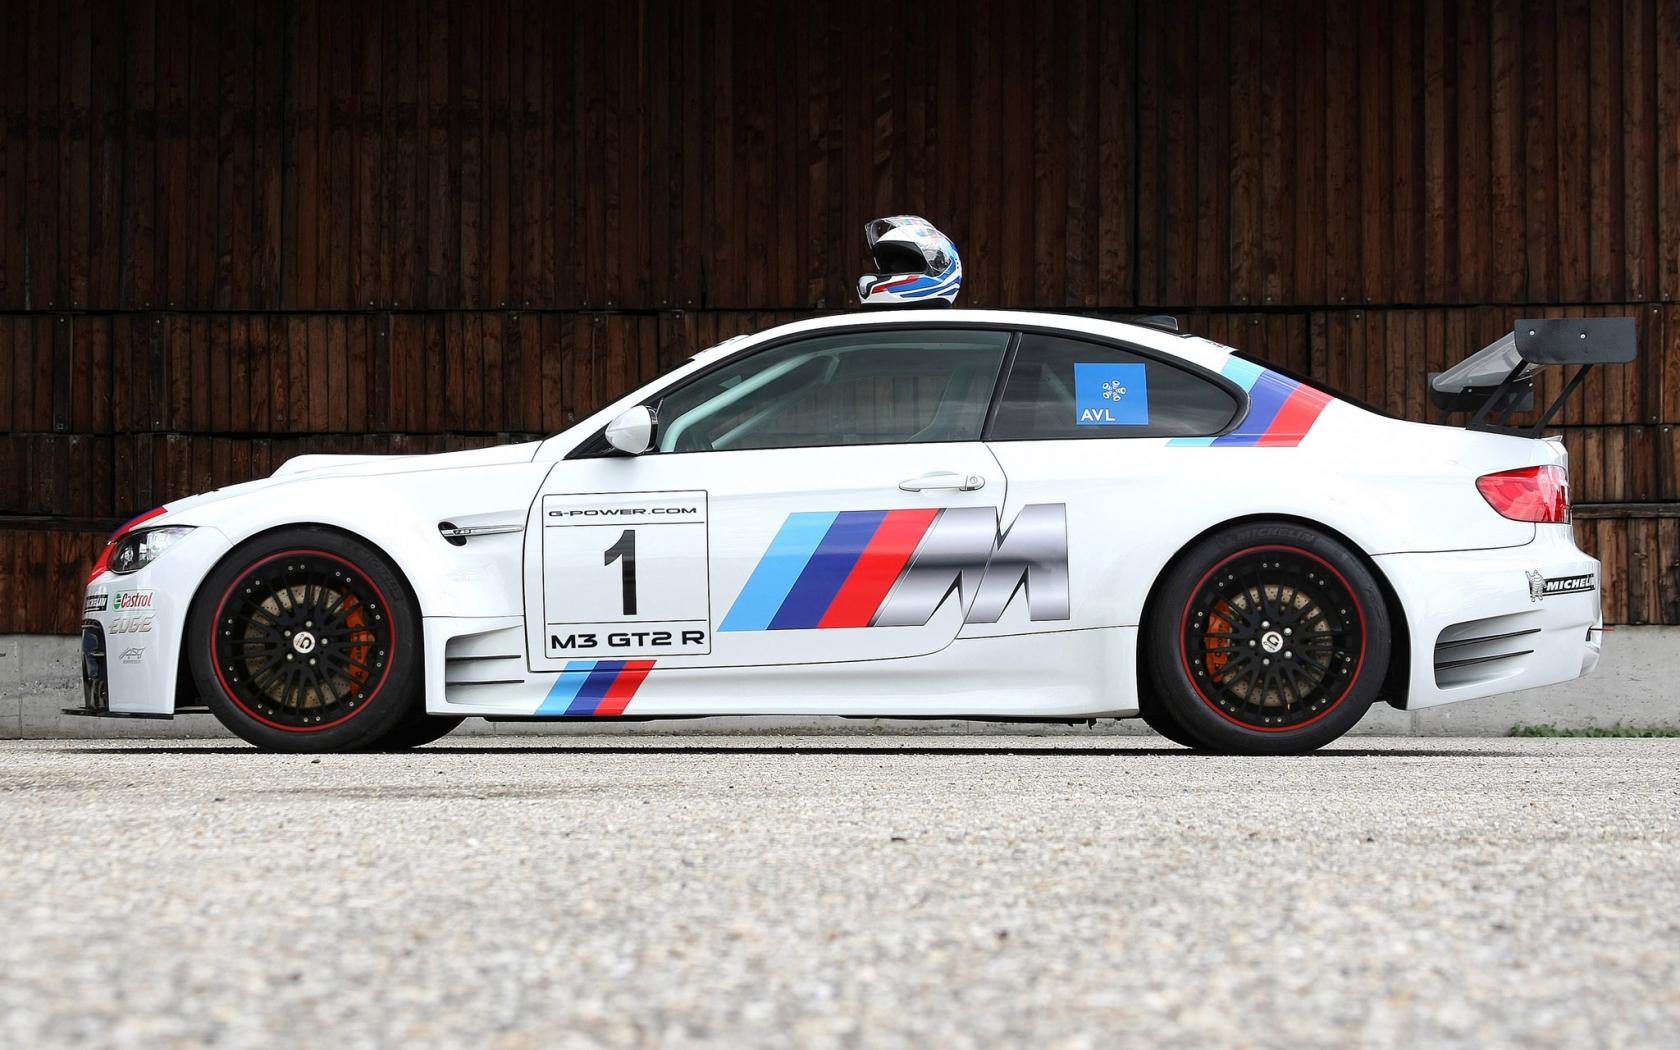 BMW M3 GT2-R E92 - 1680x1050